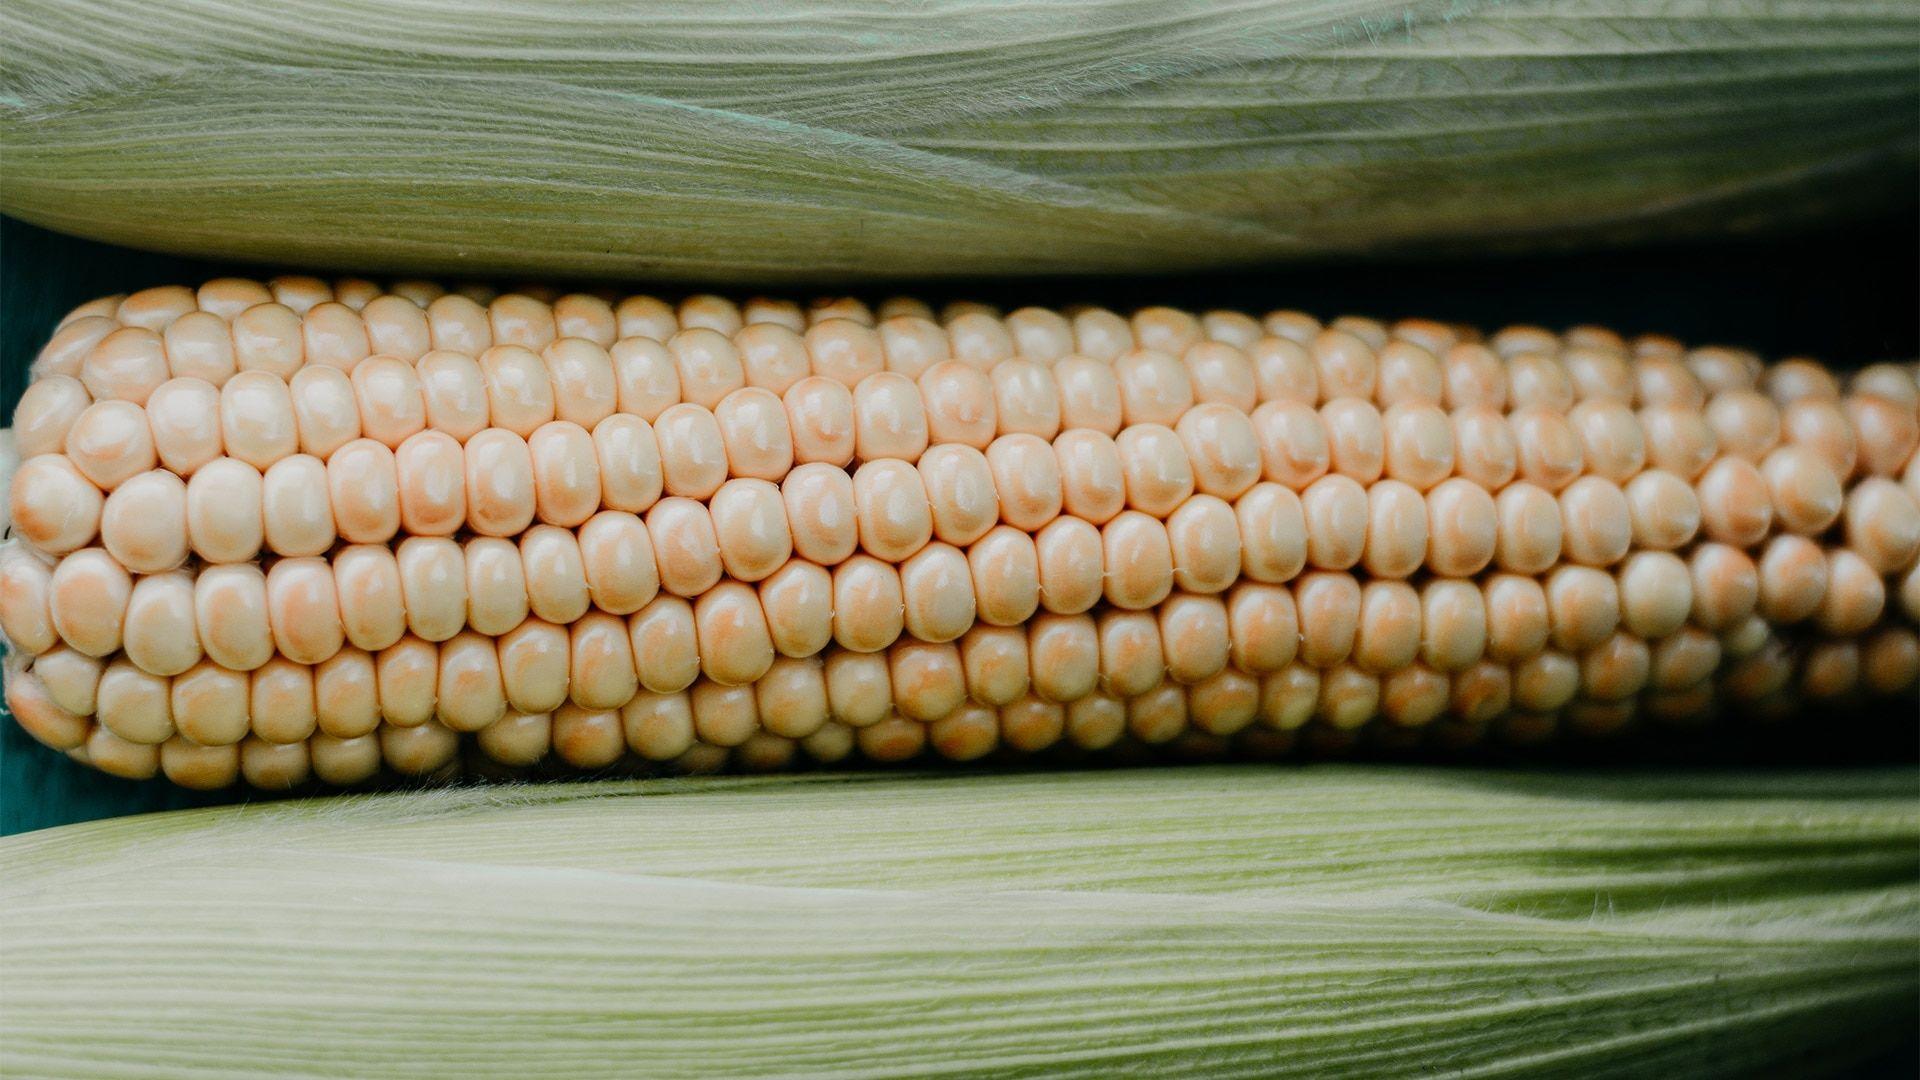 Corn 1920x1080 wallpaper